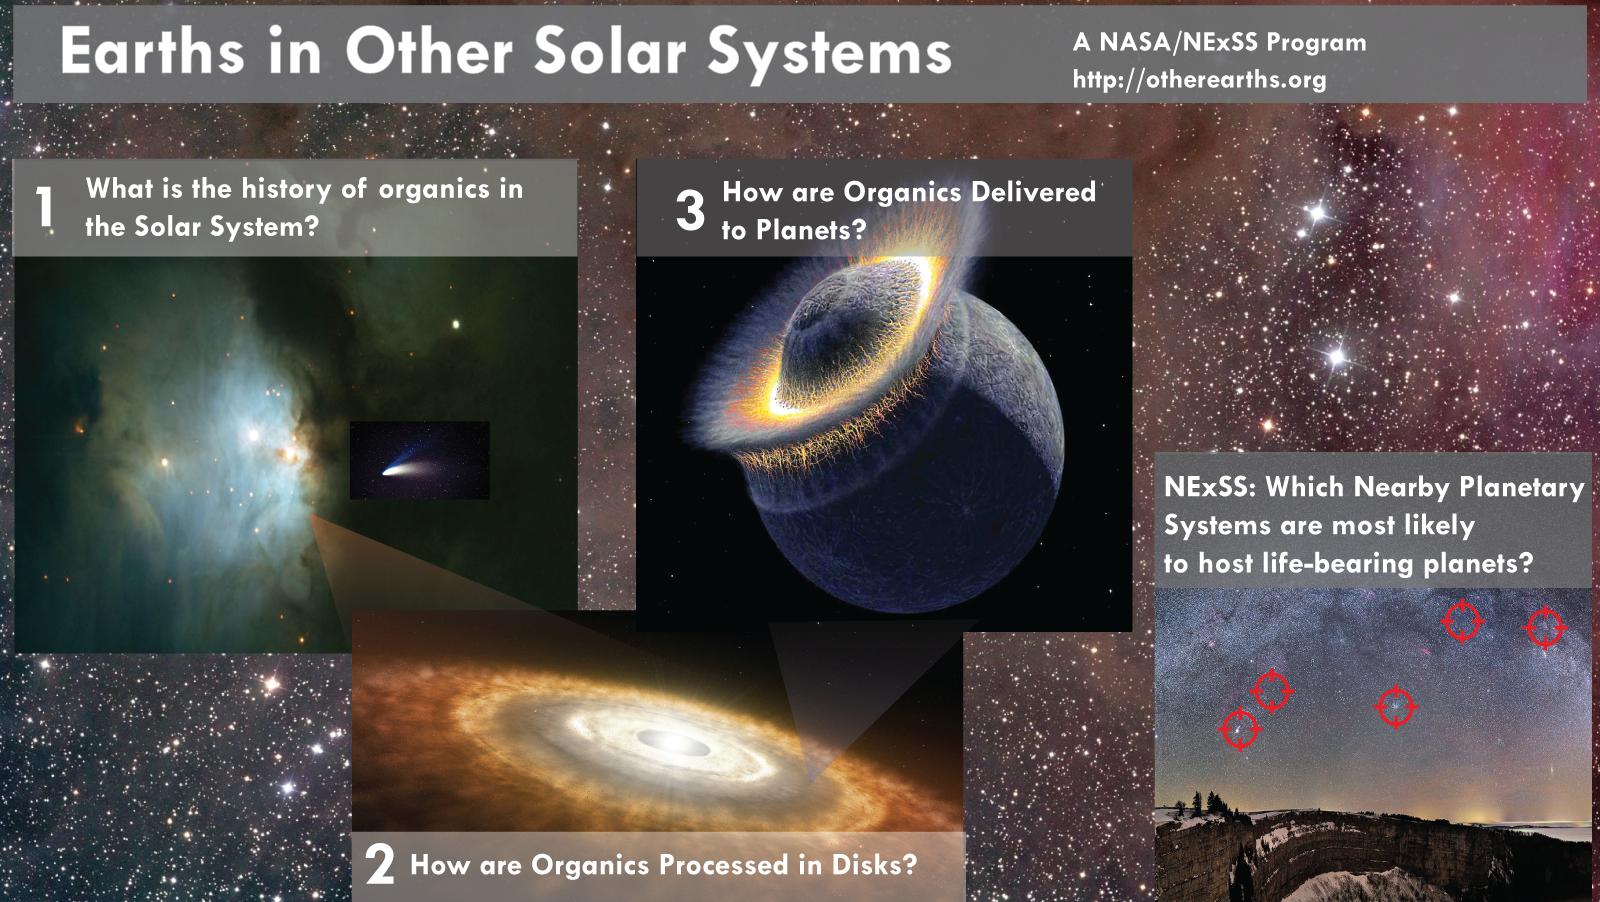 Fonte: http://eos-nexus.org/